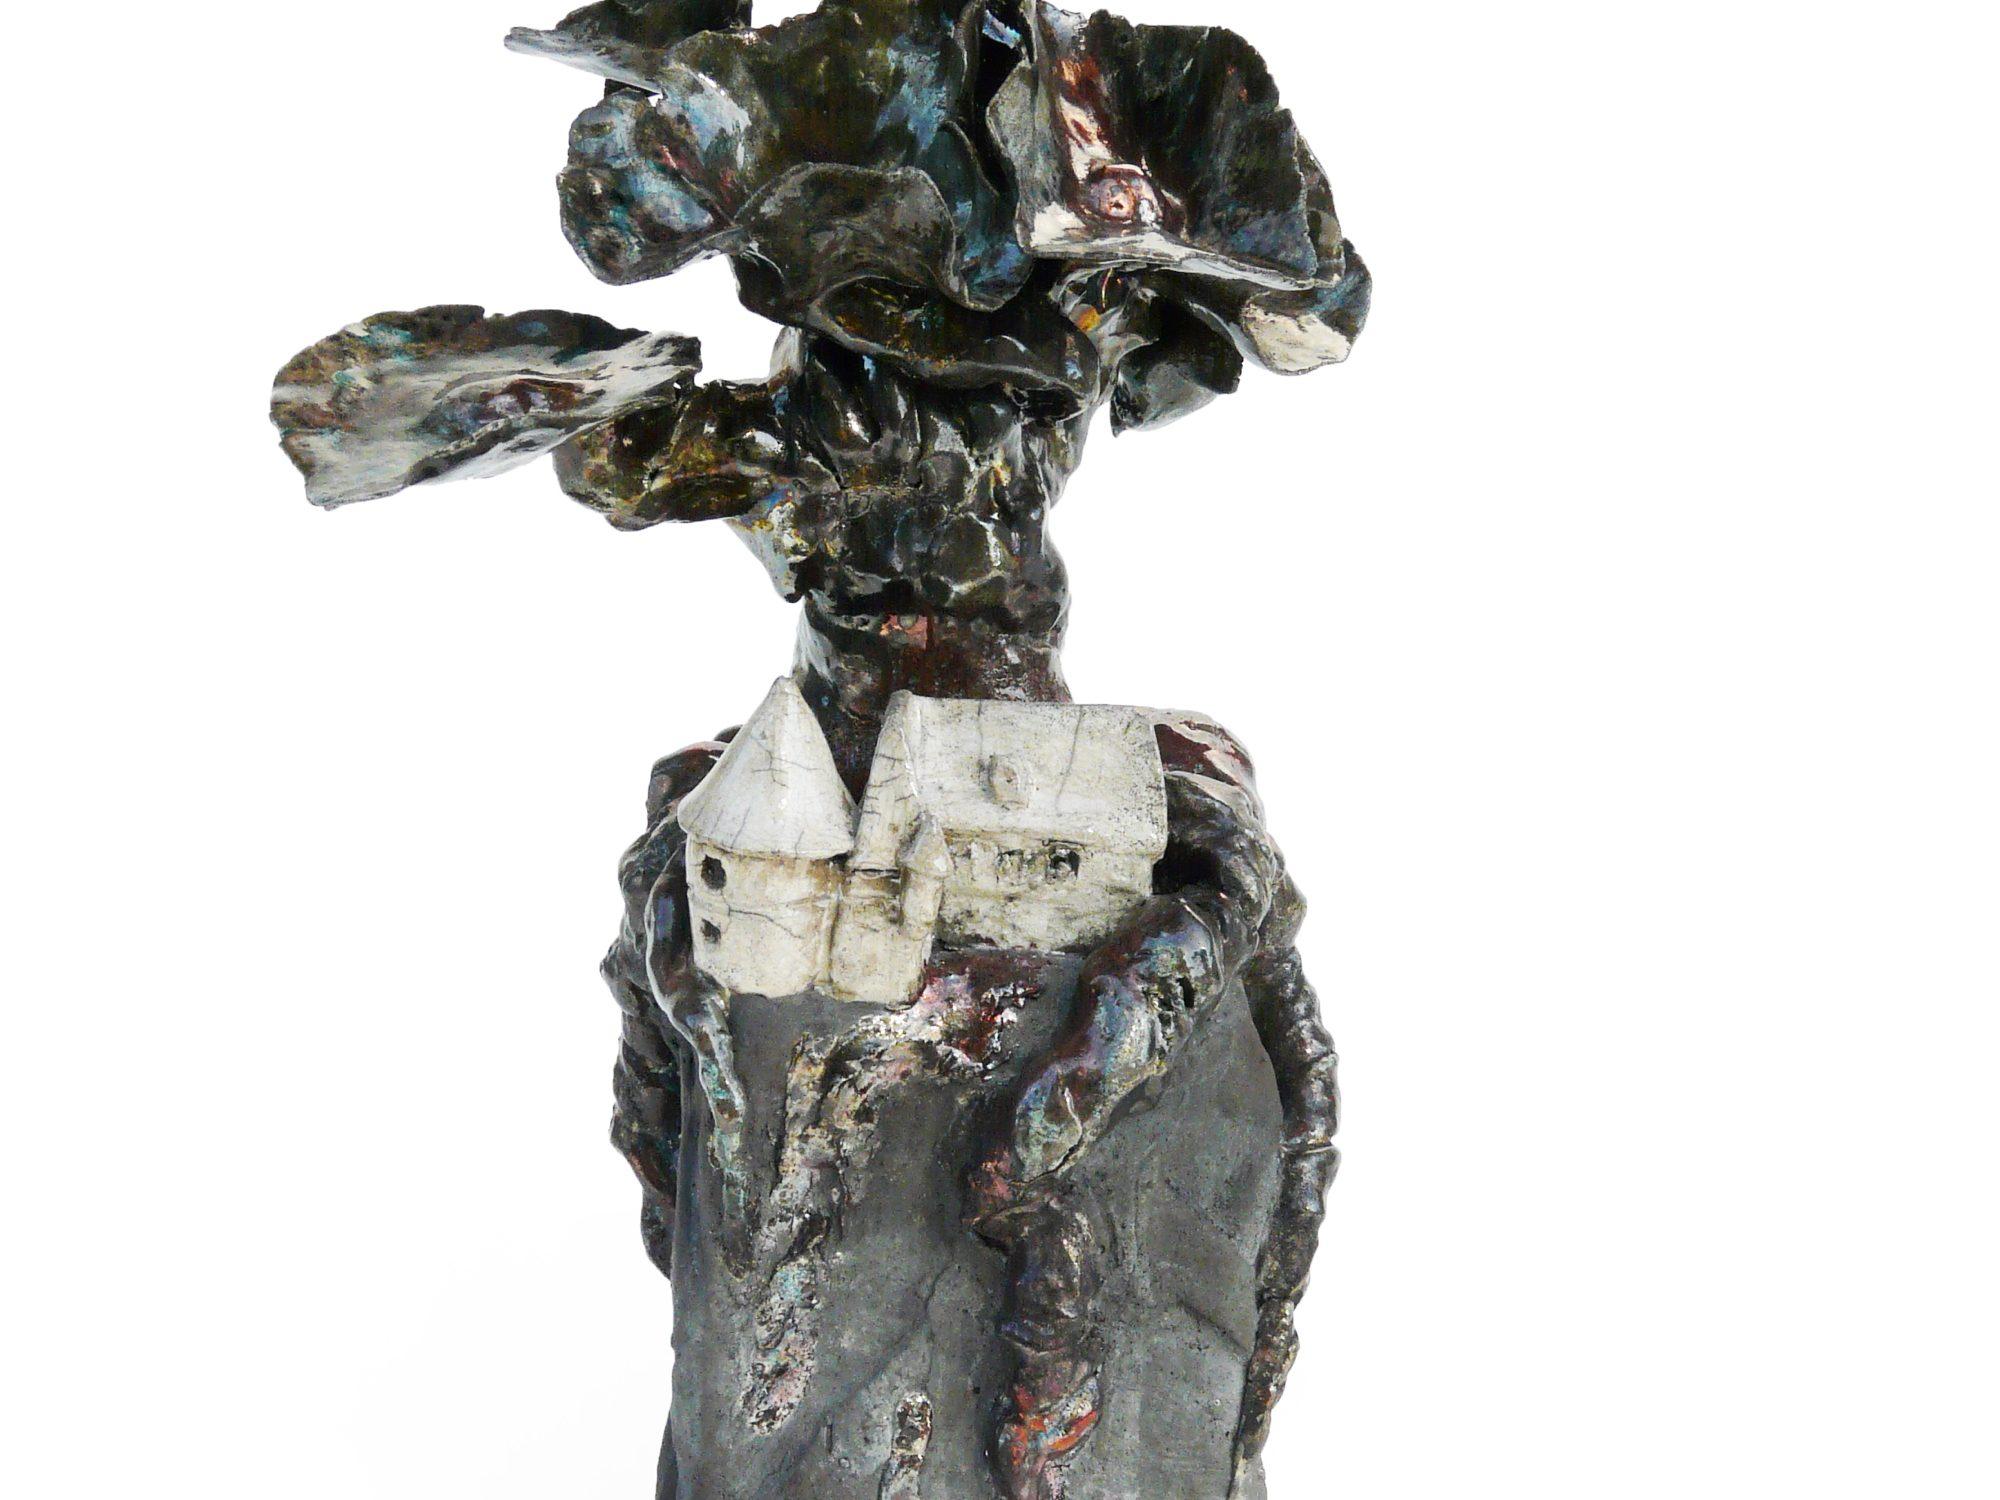 Creolium Criolium - Grès - Raku - Sculptures céramique de Florence Lemiegre